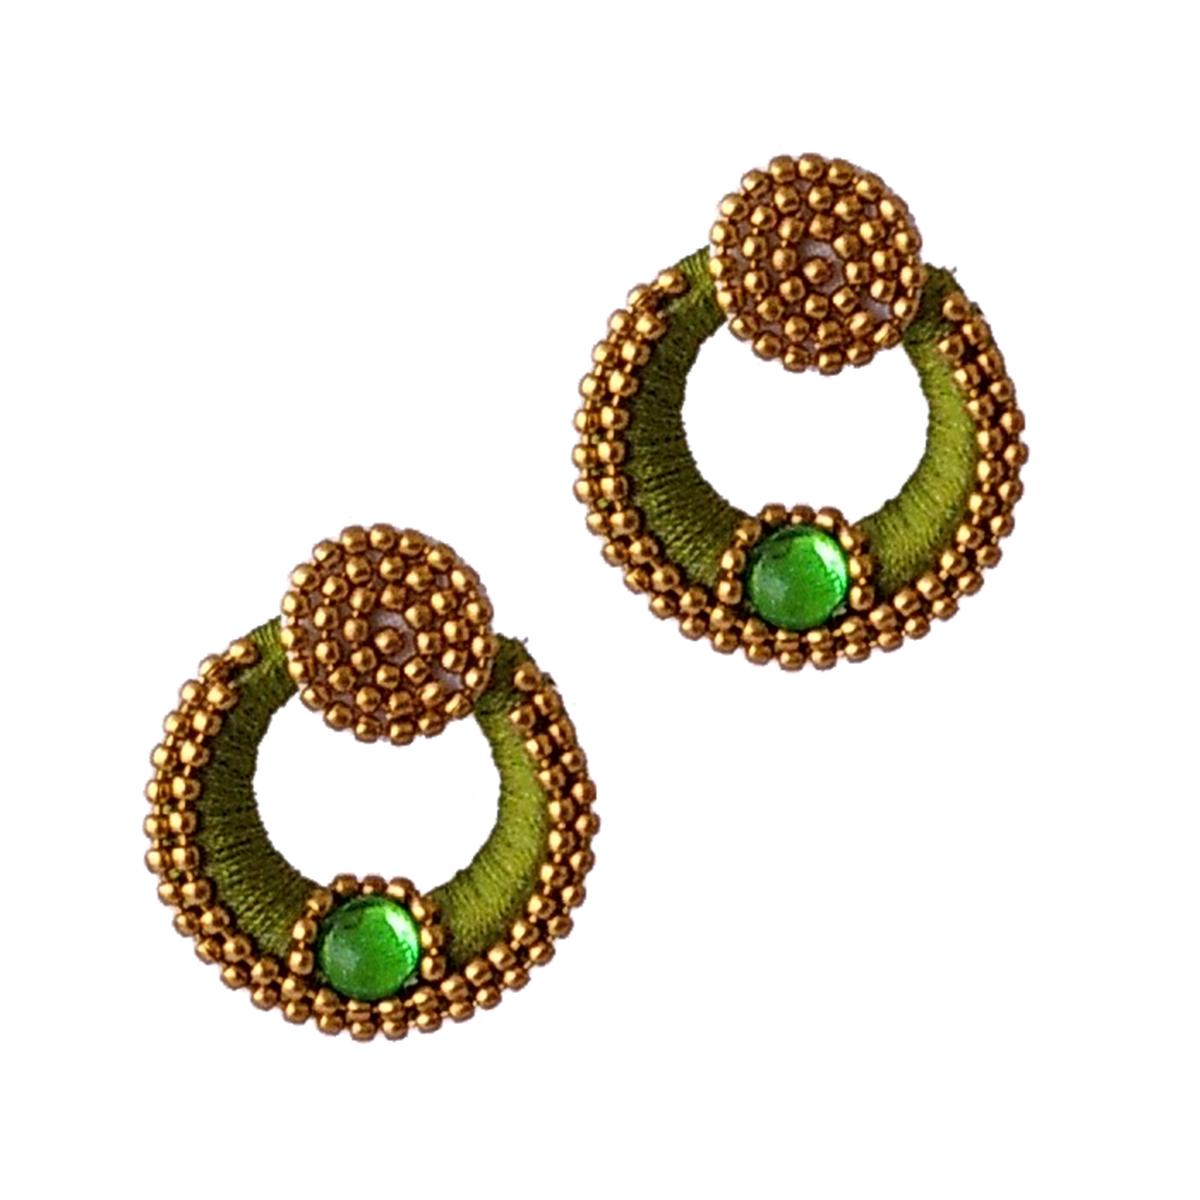 393c657cc821c Chandbali – Buy Gold Design Chand Balis Earrings & Jewellery Online